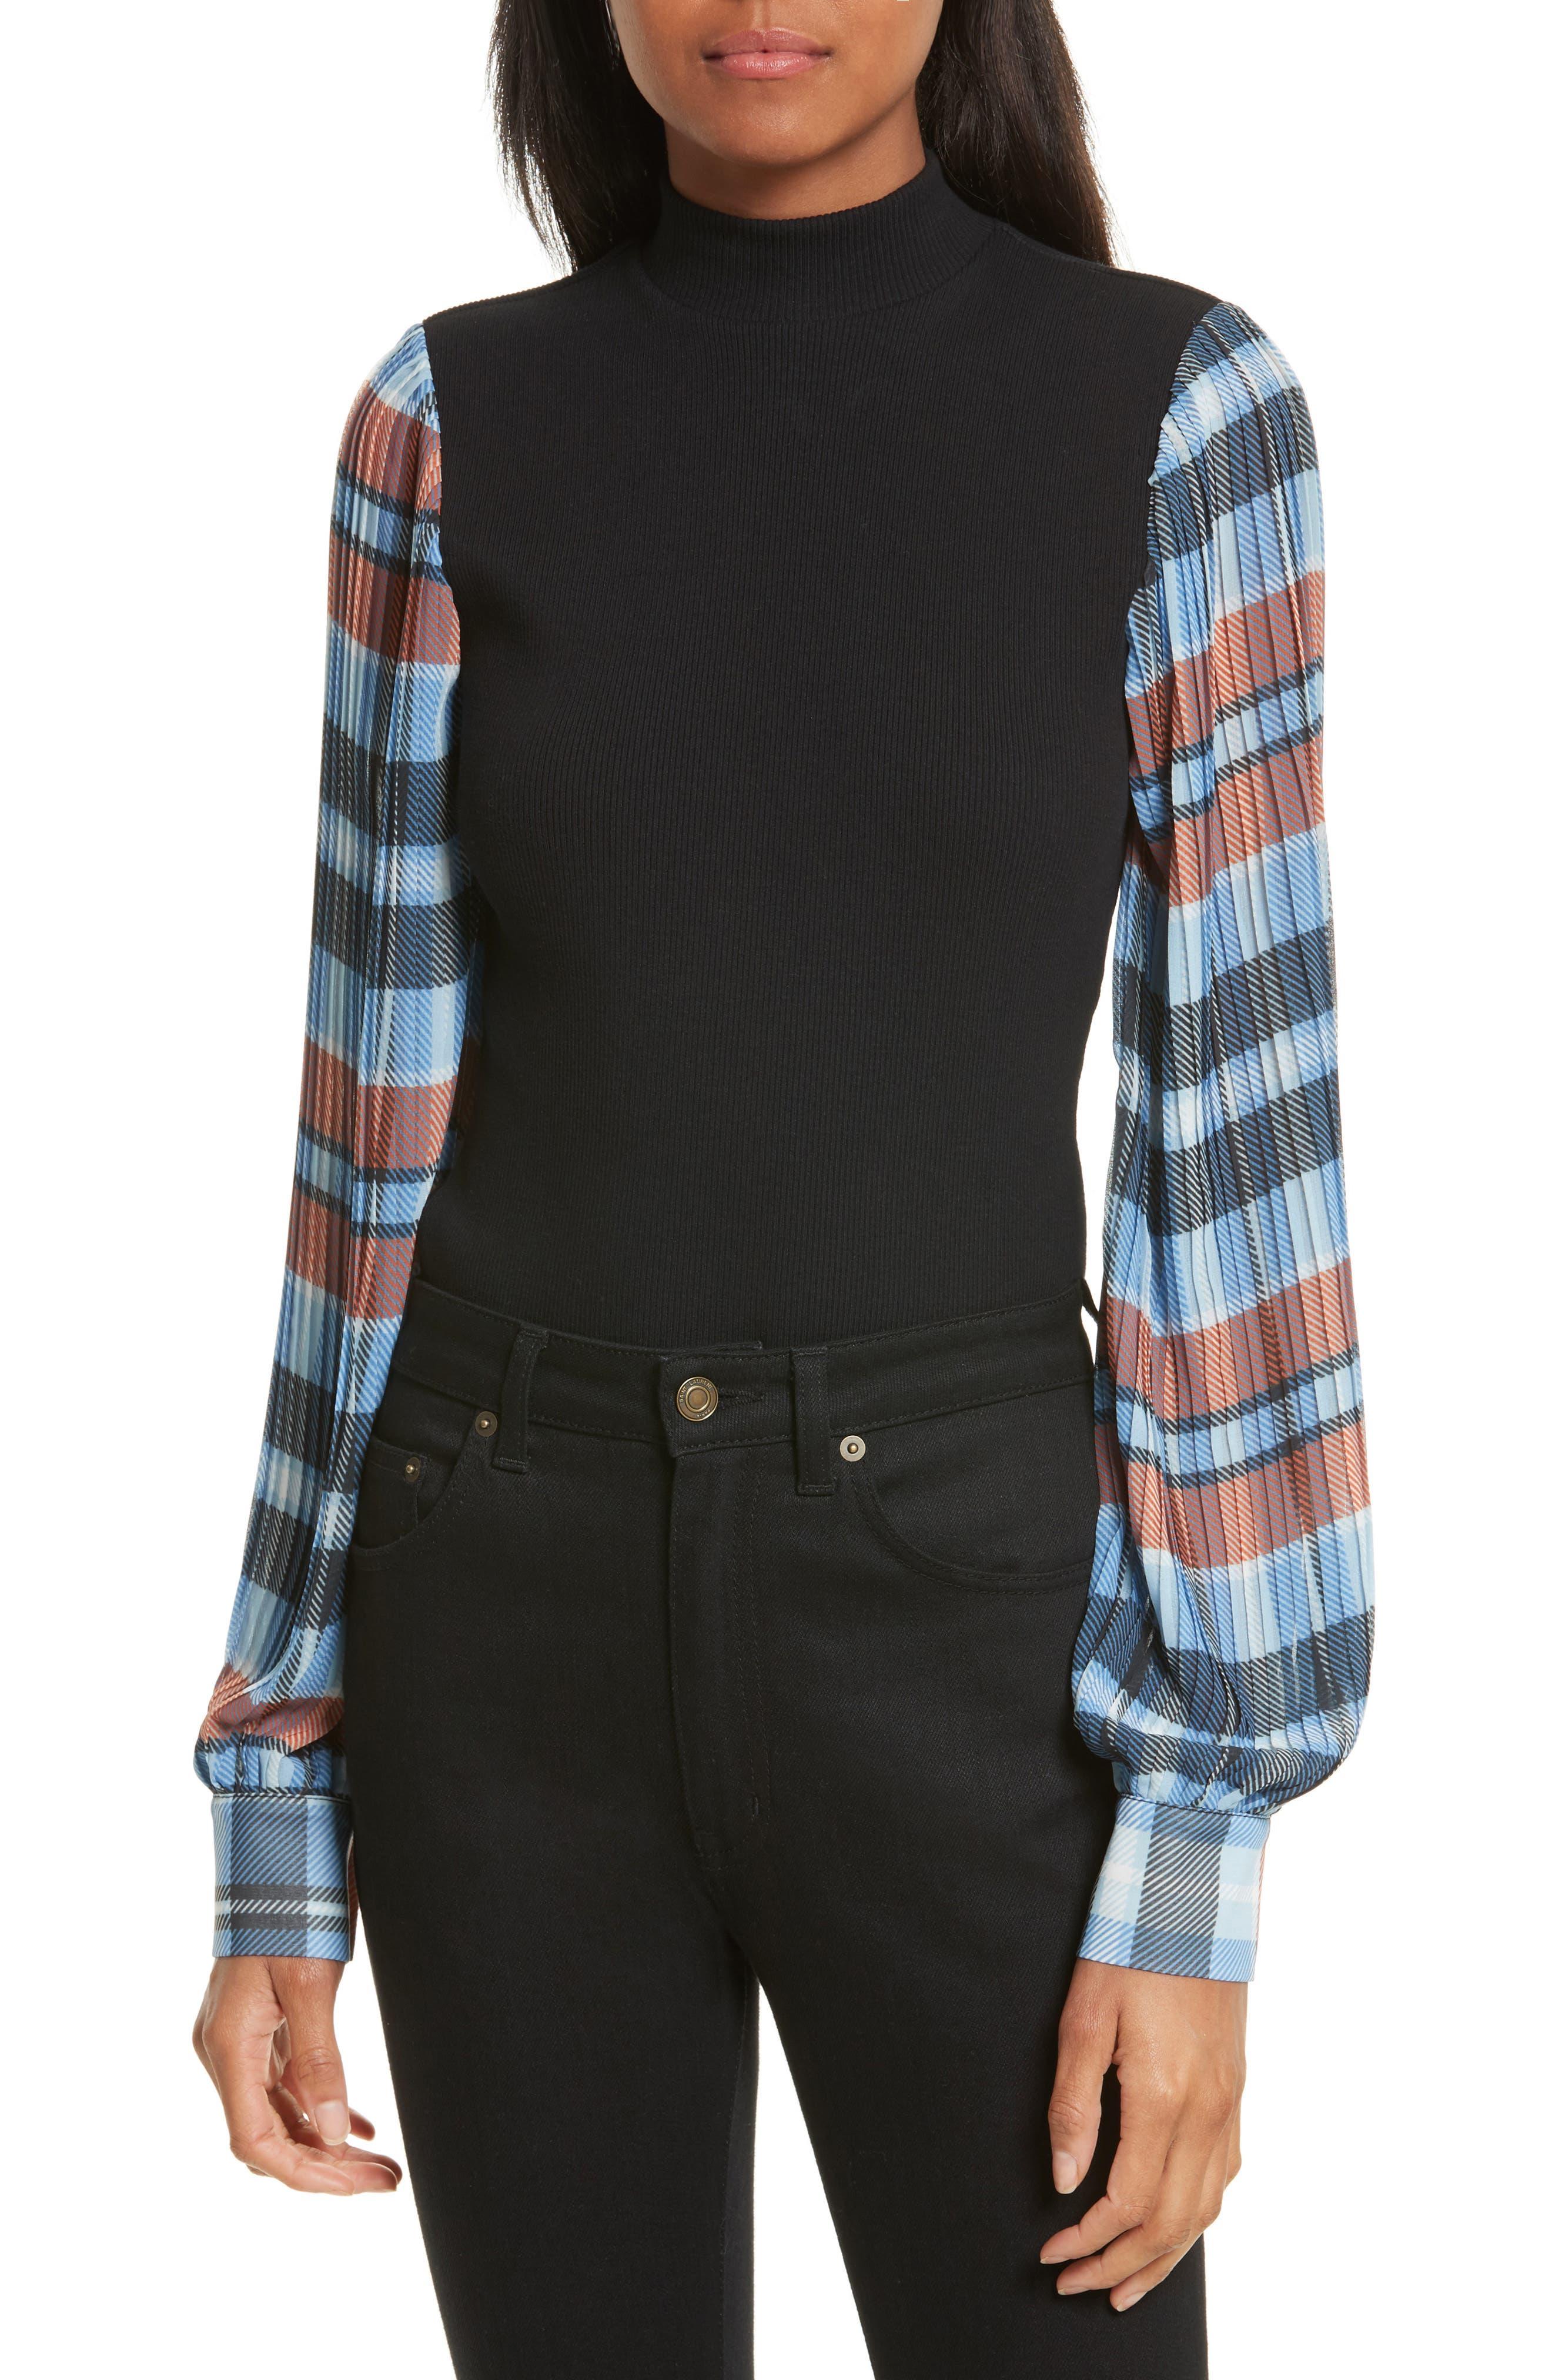 OPENING CEREMONY Plaid Sleeve Bodysuit